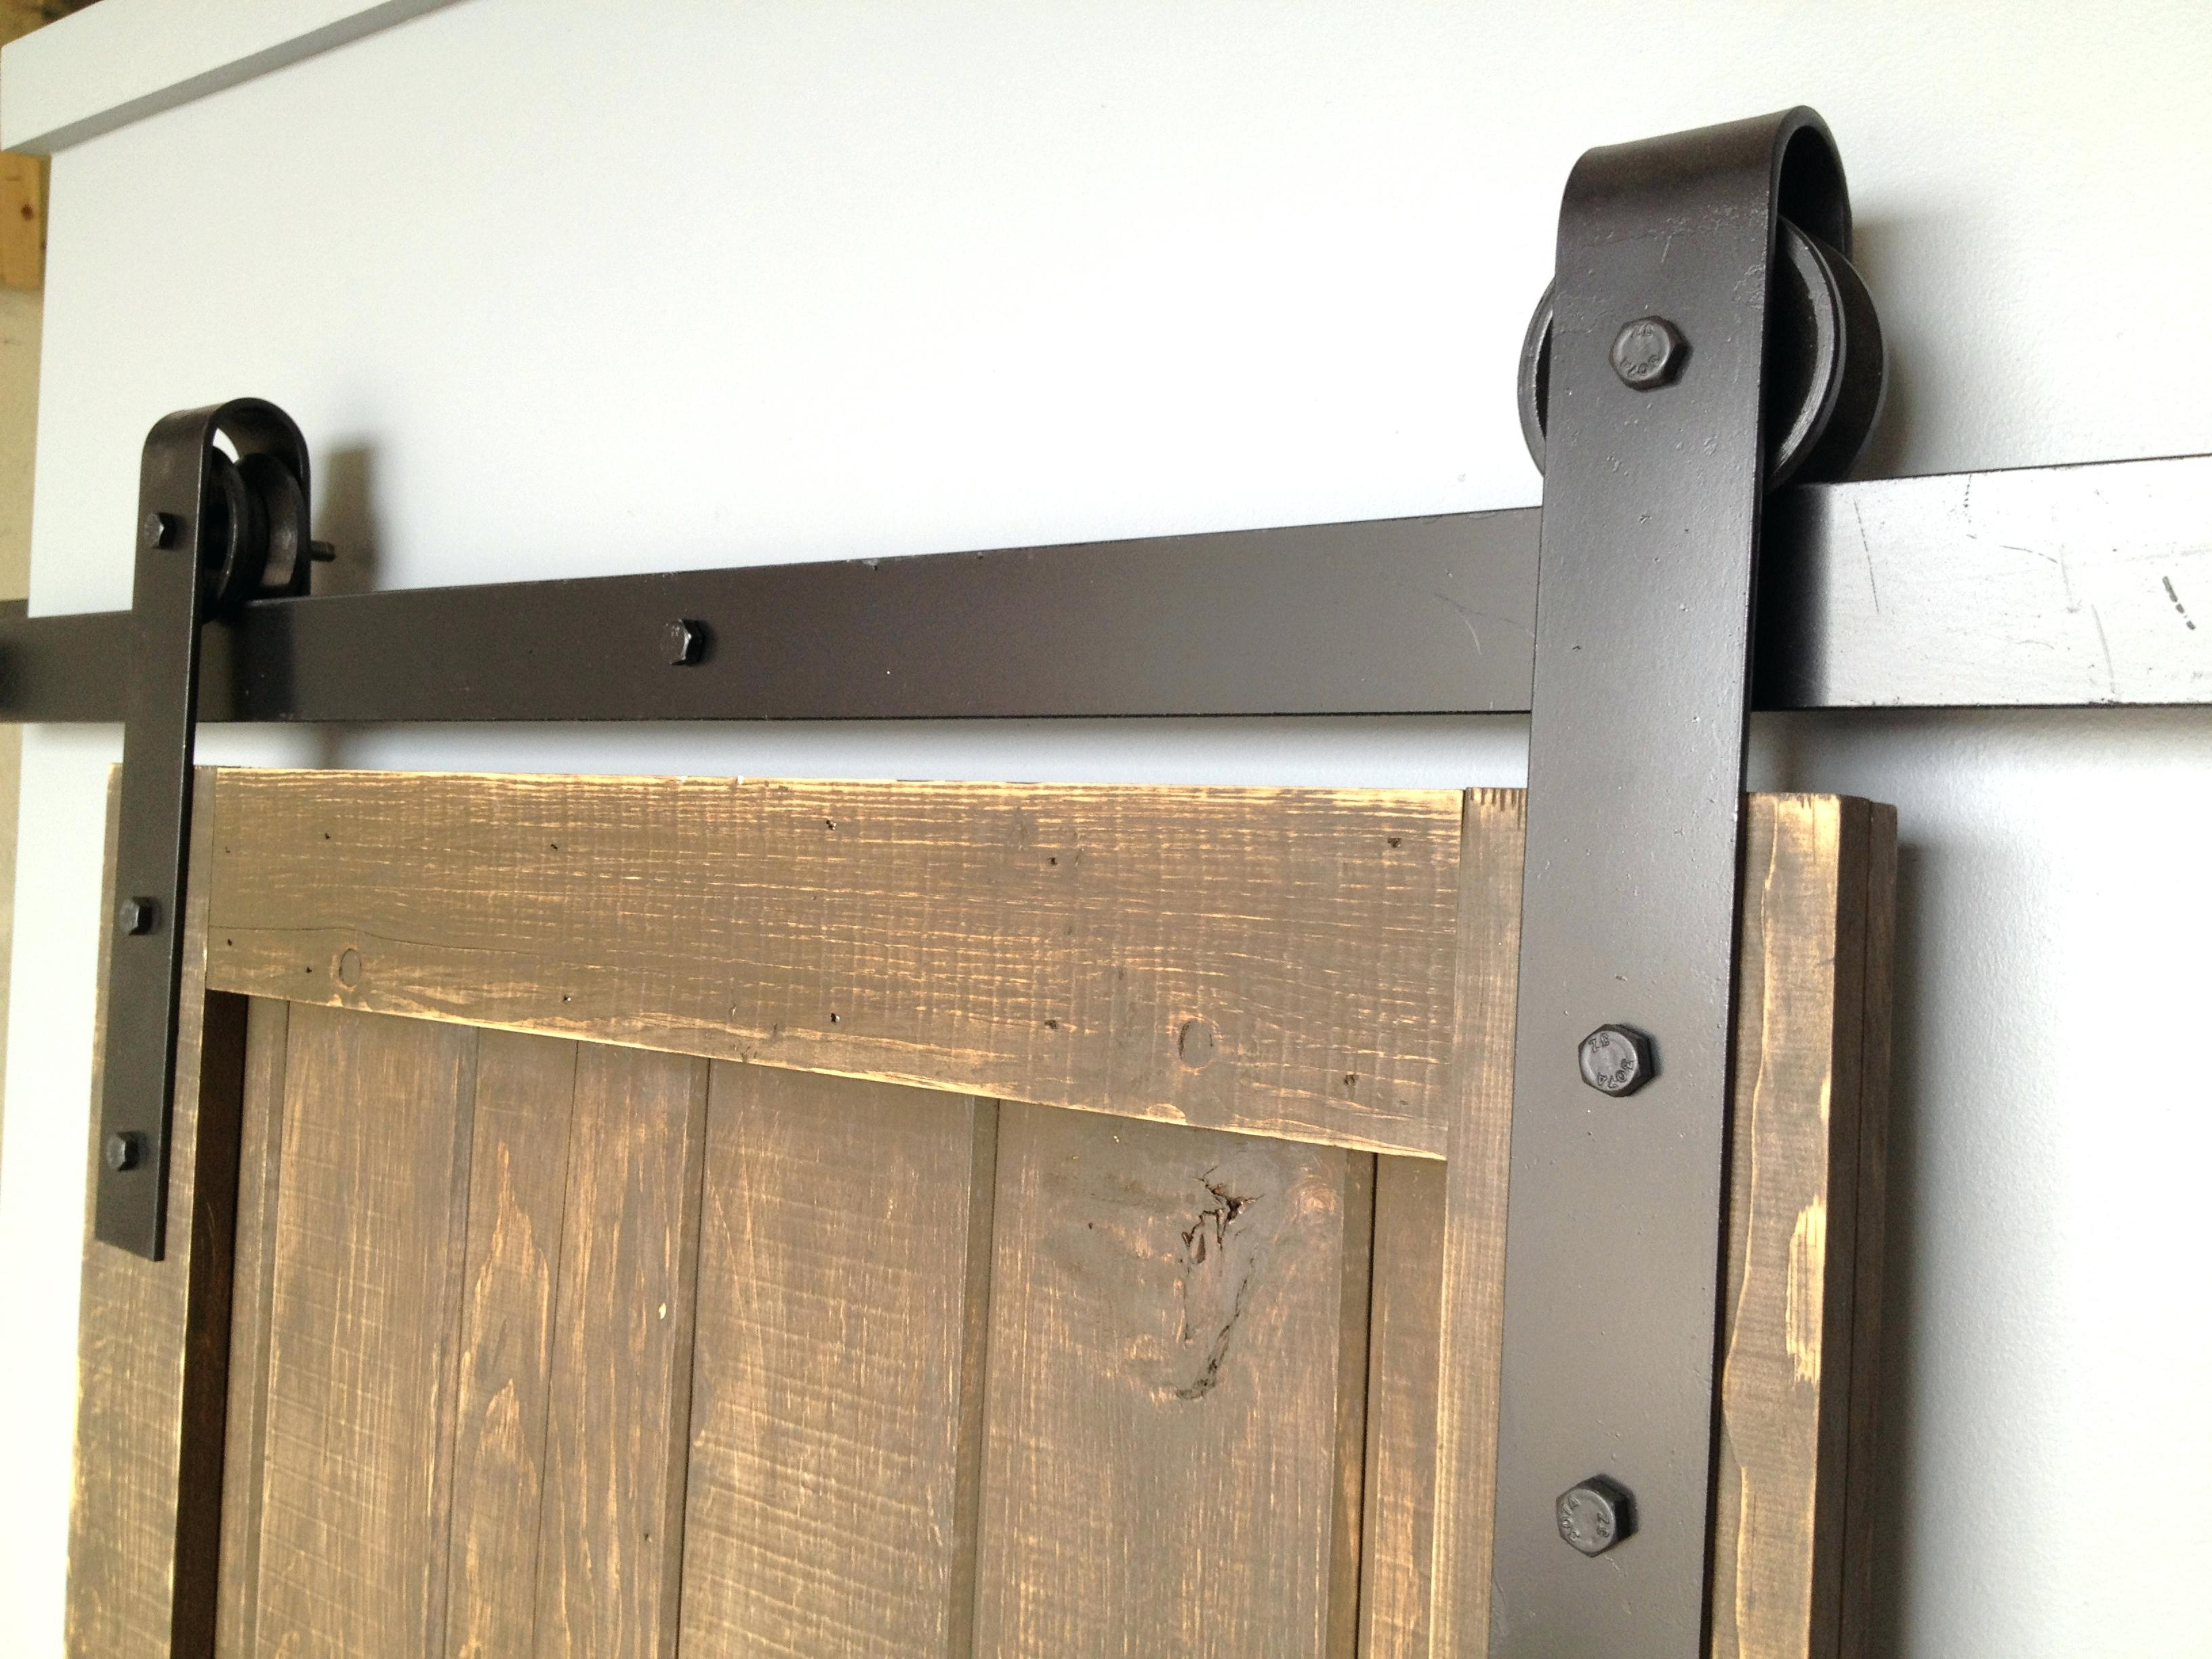 Sliding Barn Door Bathroom Lock3264 X 2448